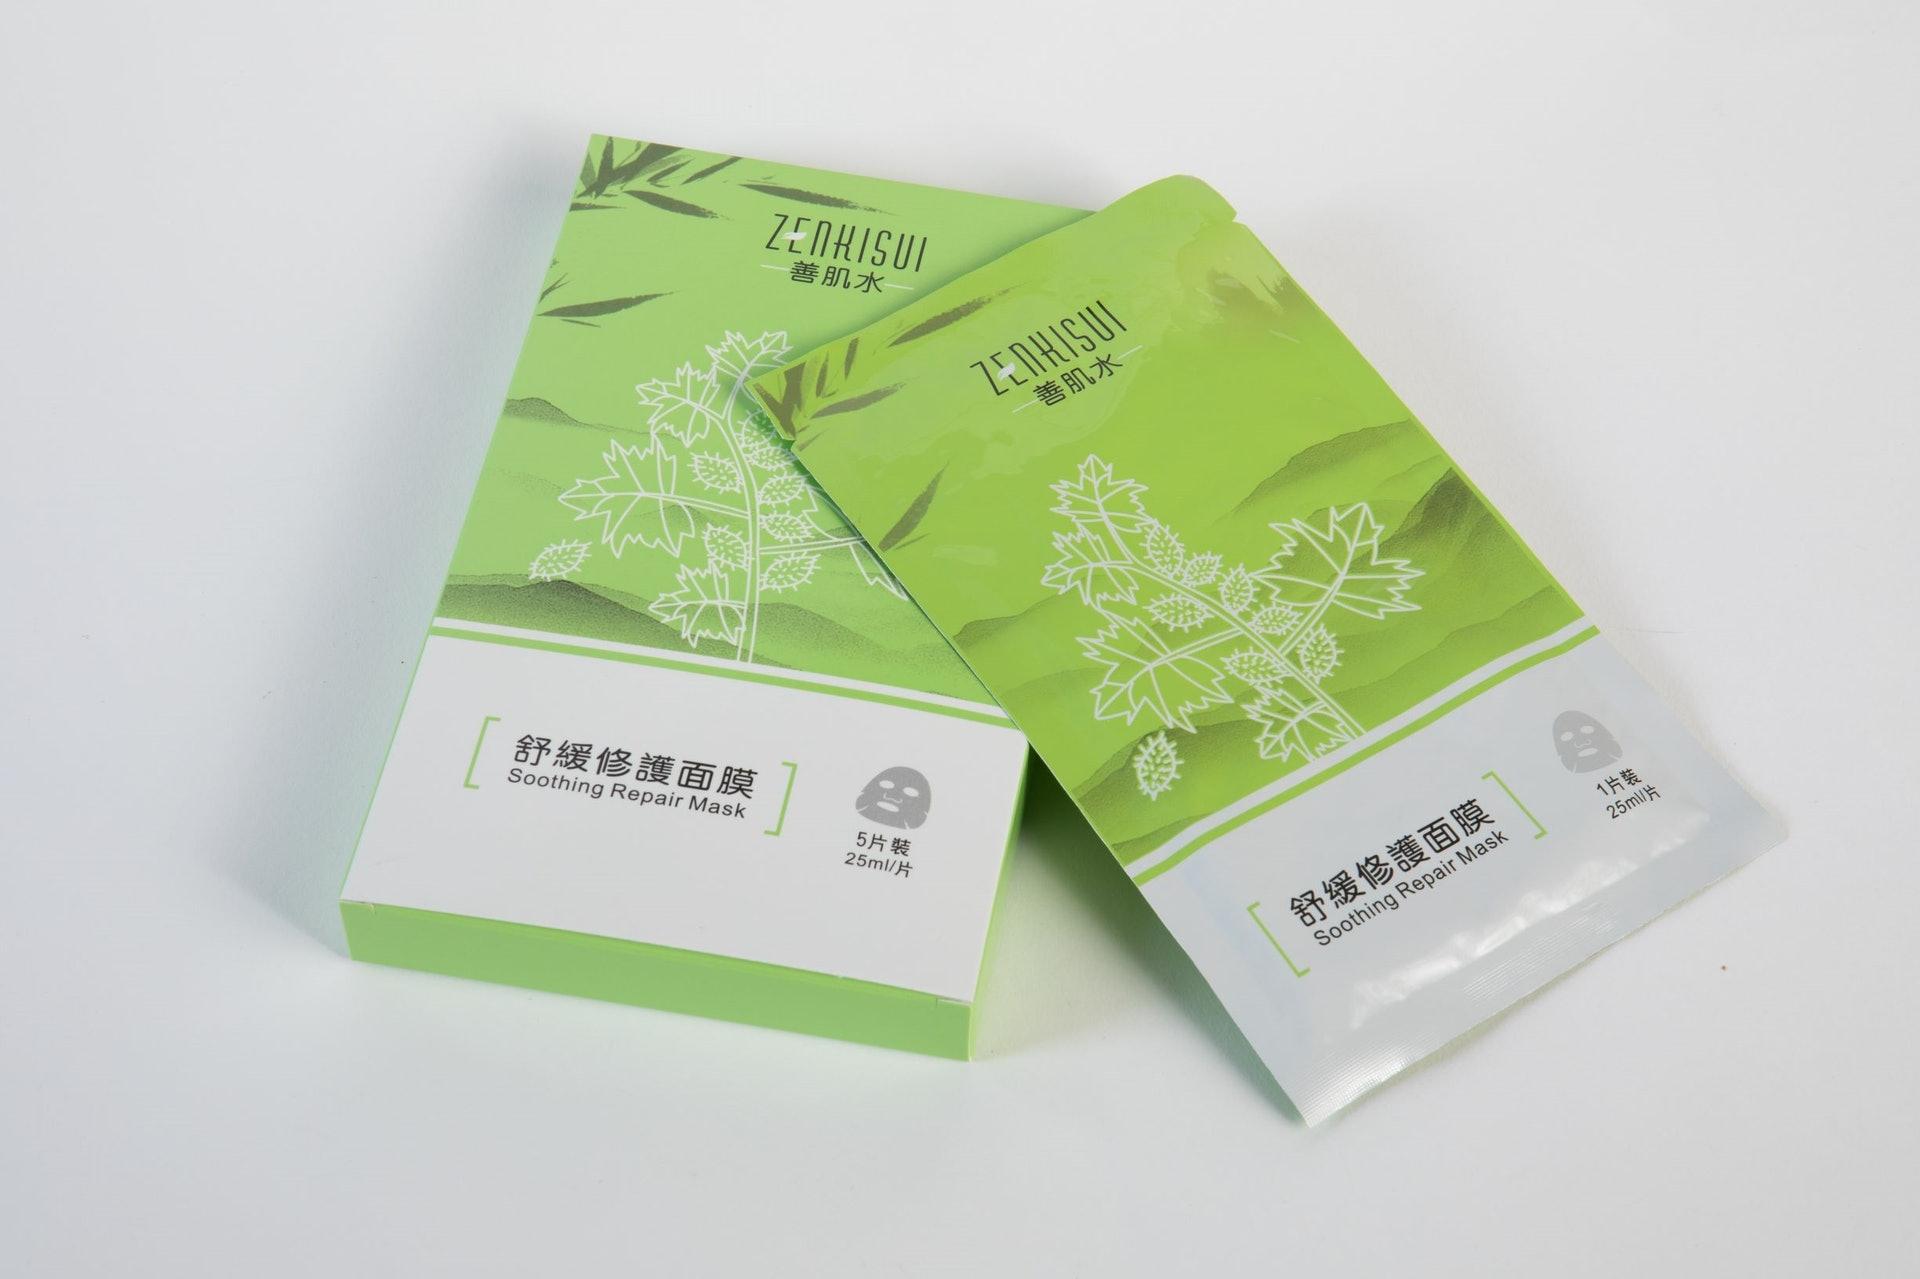 Zenkisui 善肌水 - 舒緩修復面膜,有效抗菌消炎,祛濕止癢。